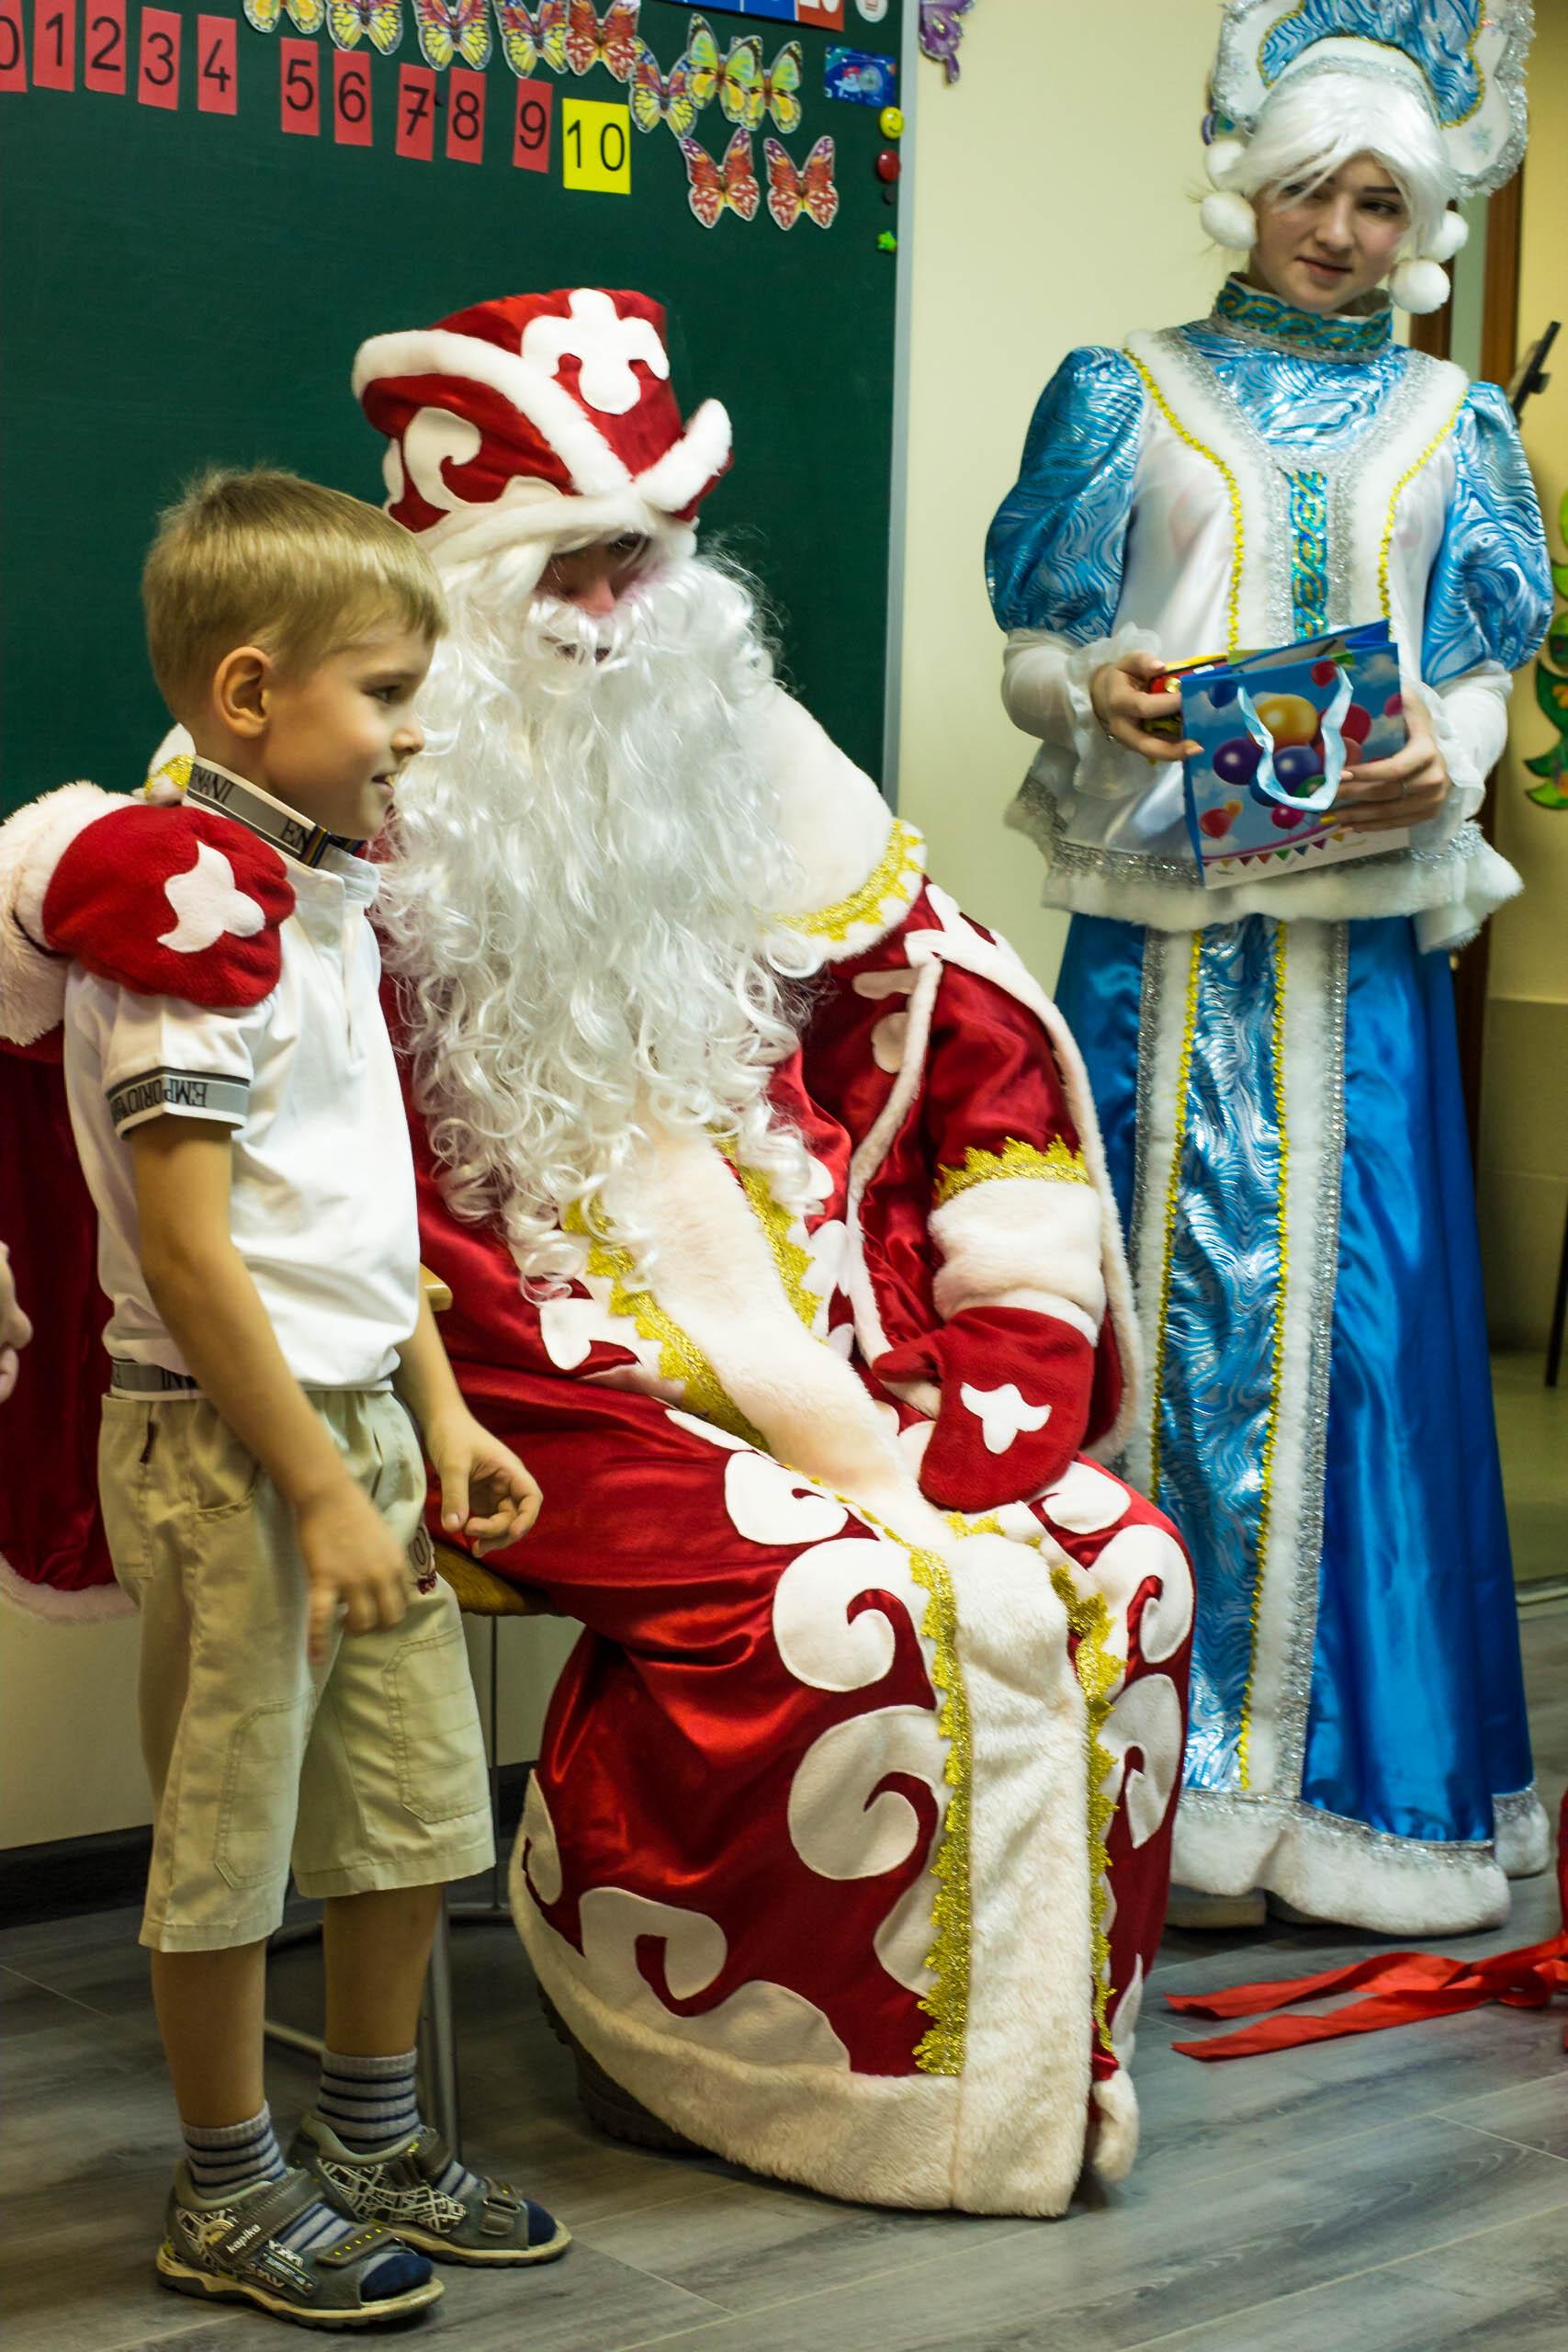 Дед Мороз и Снегурочка дарят ребенку подарок